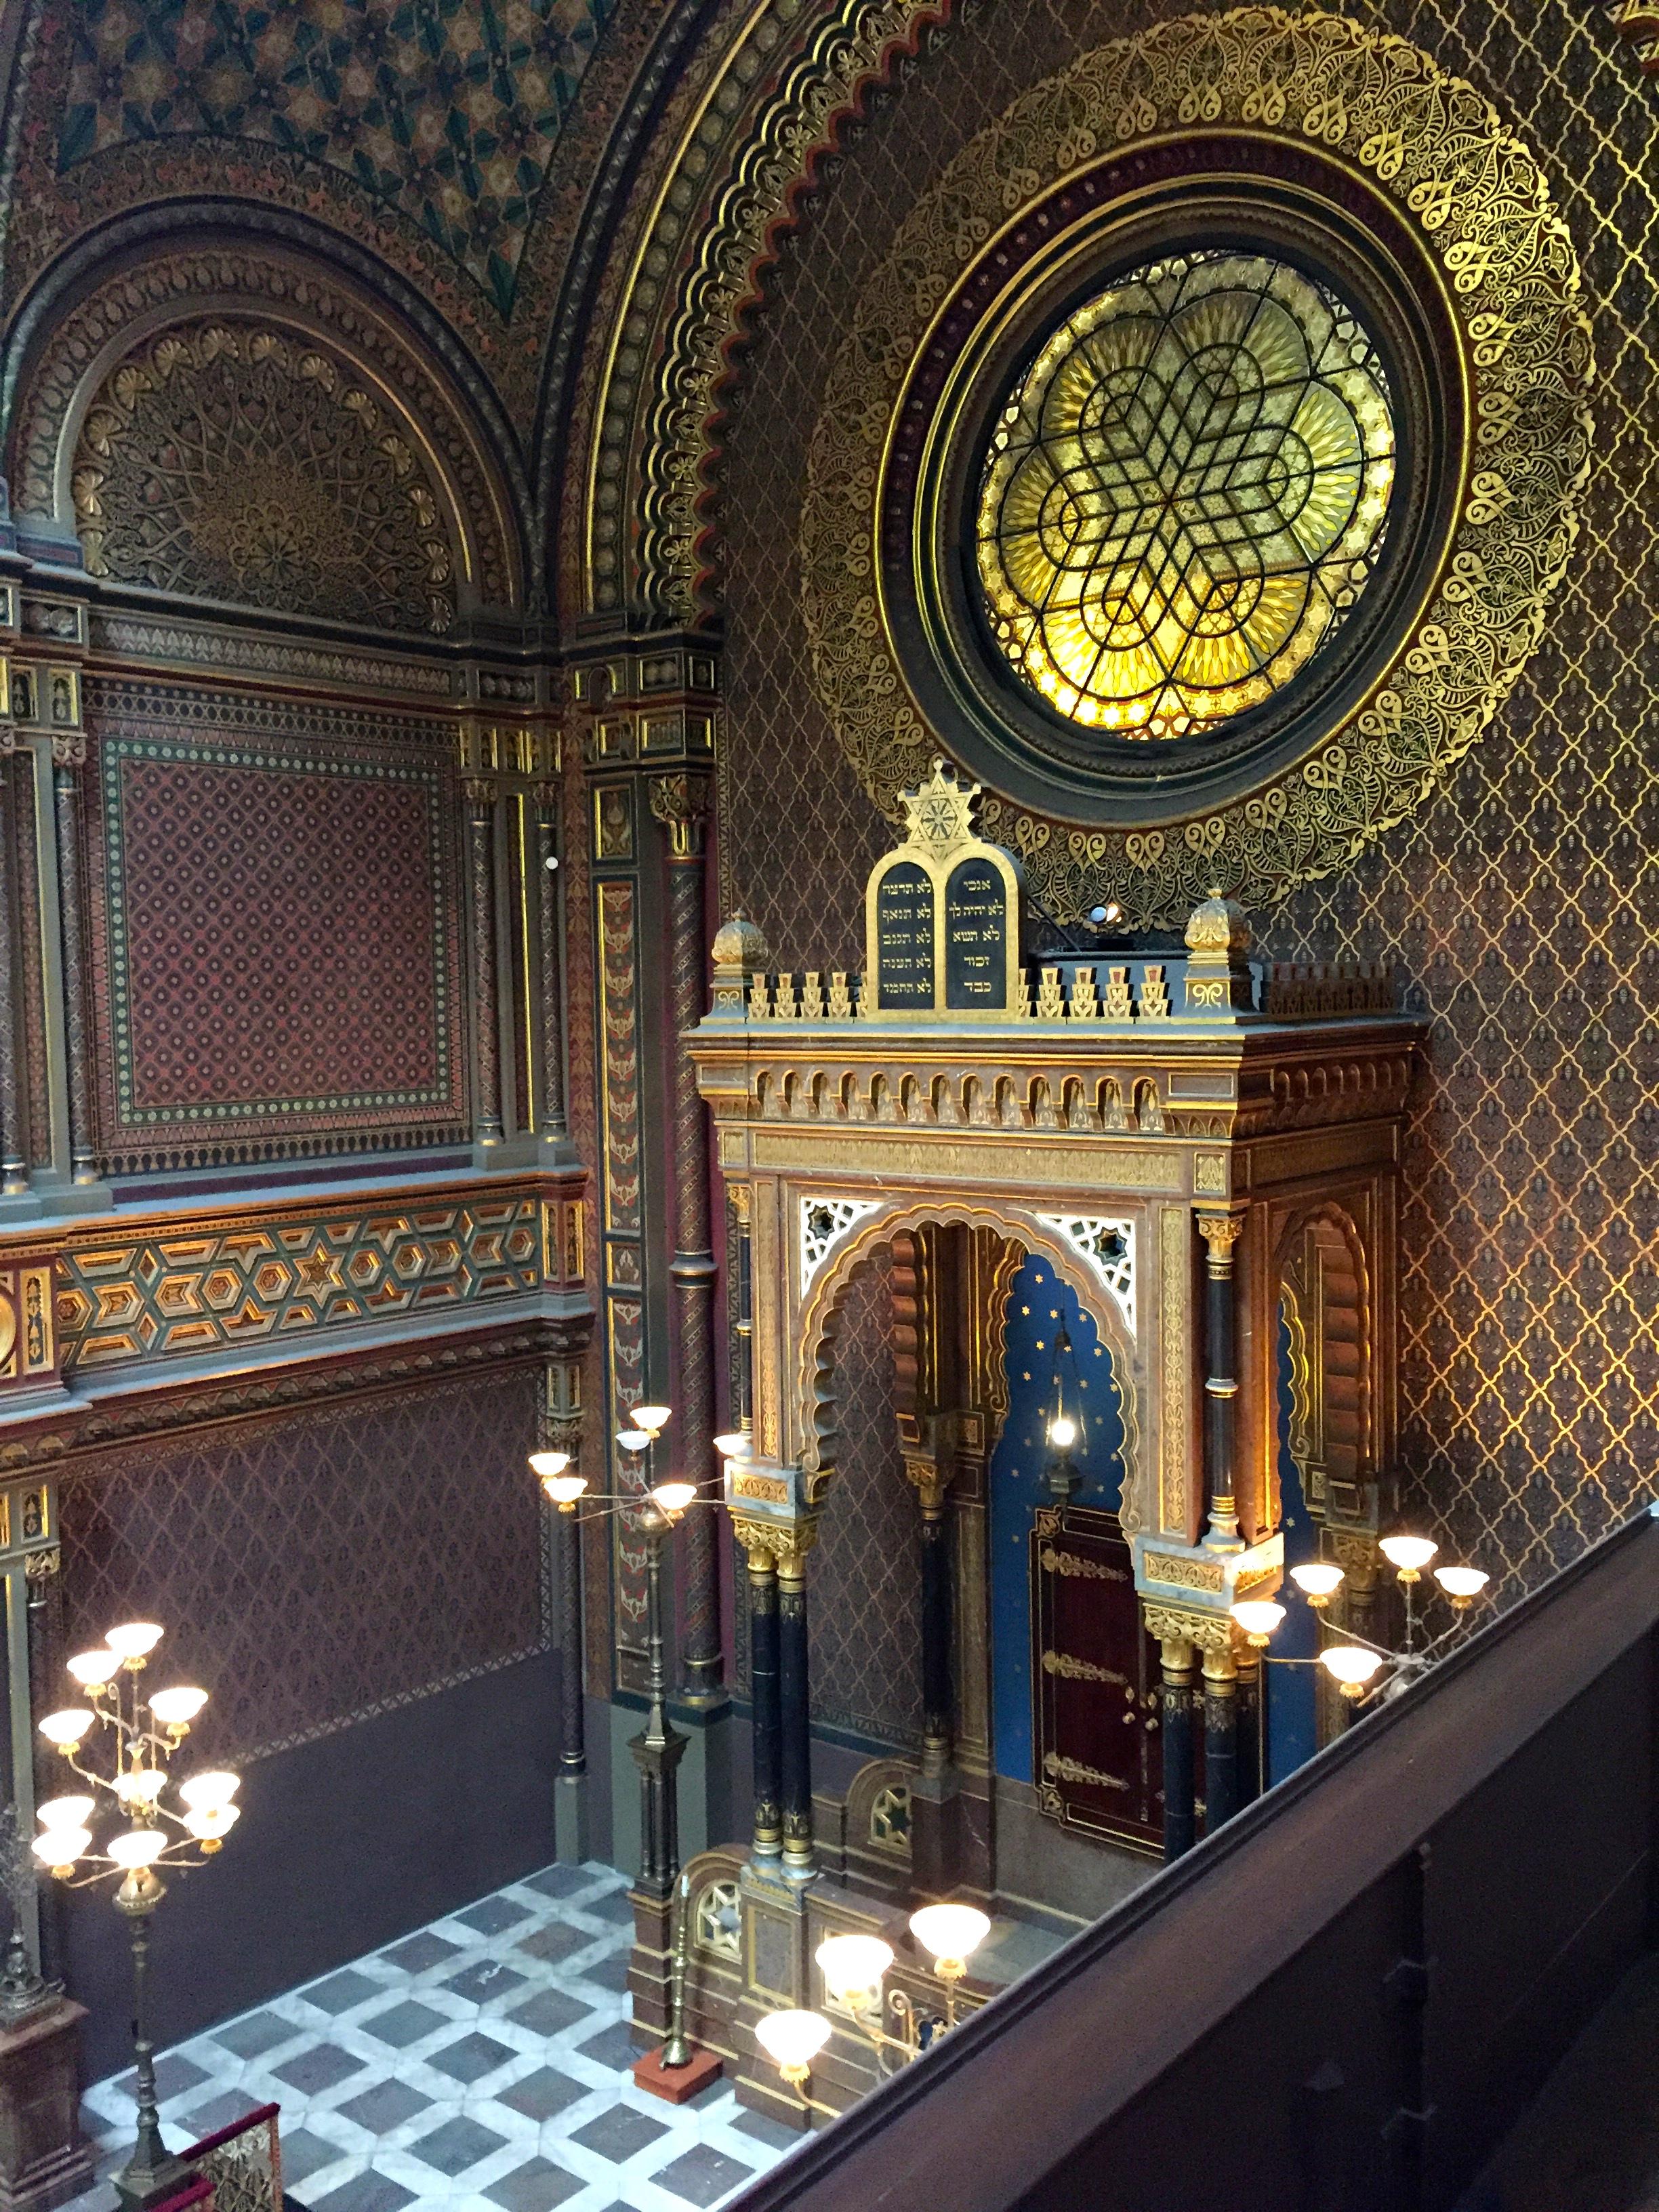 spanish-synagogue-jewish-quarter-prague-attractions